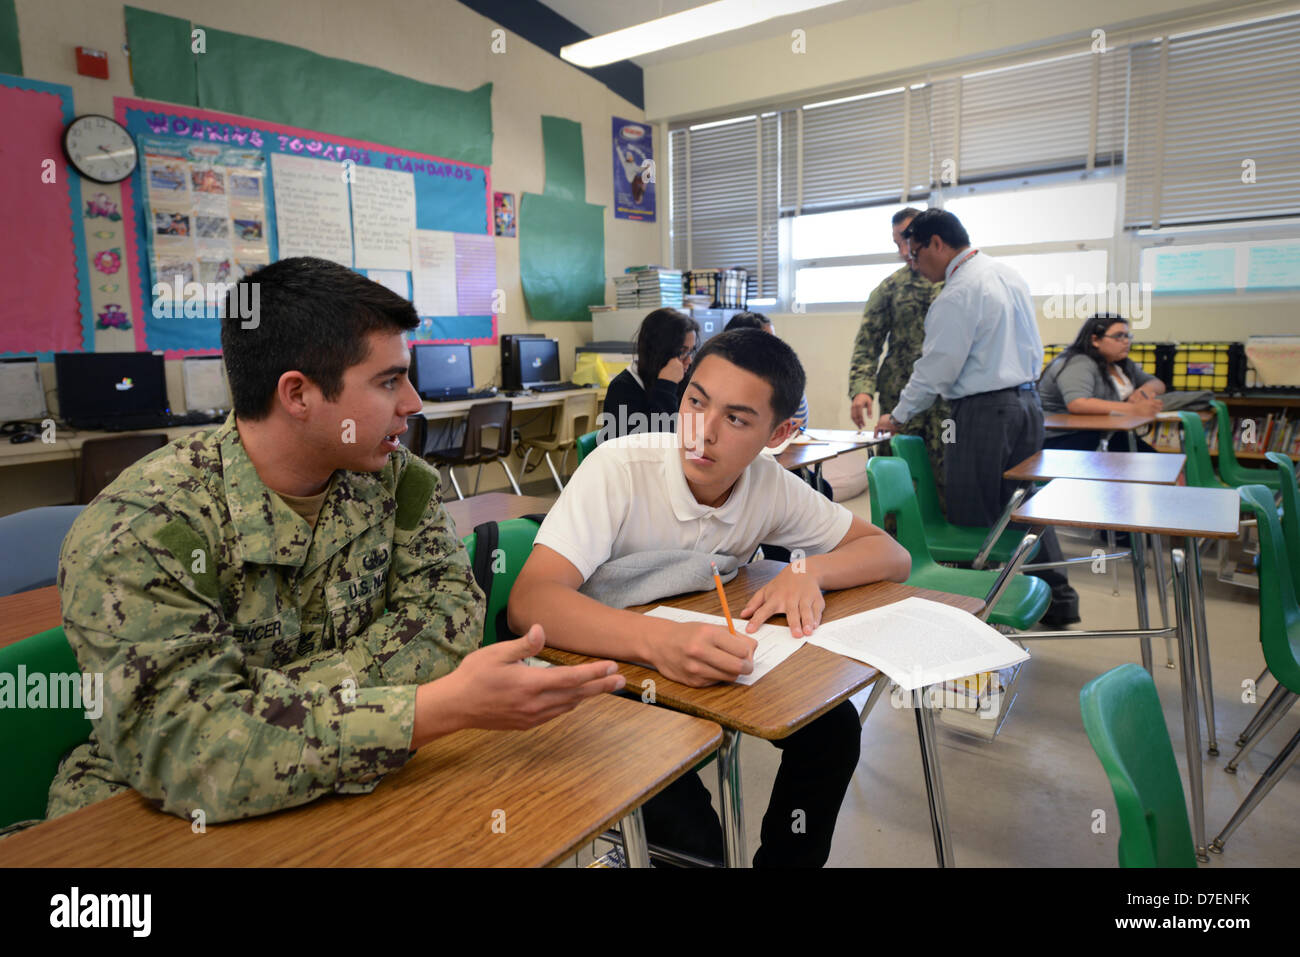 Sailors perform community service. - Stock Image